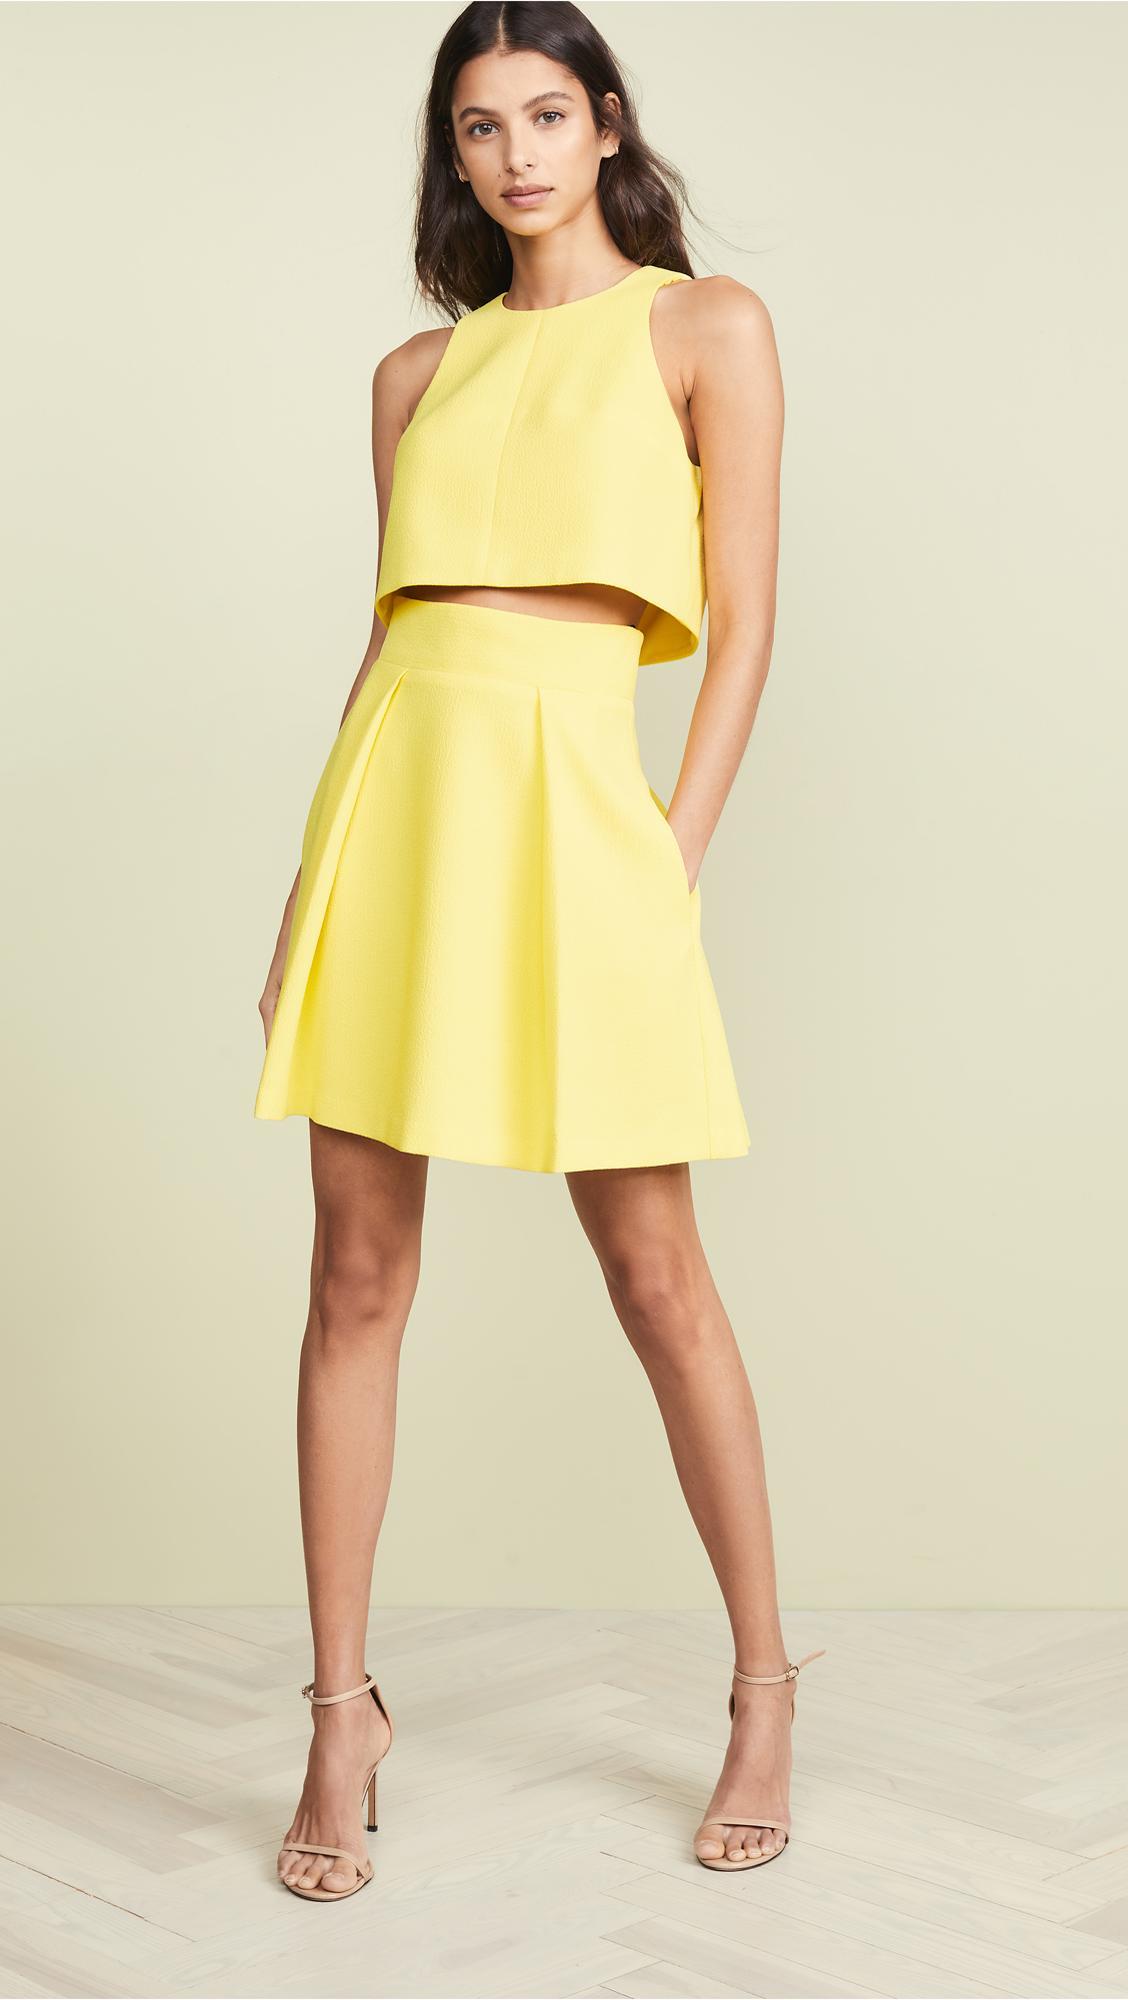 cb688f1c92d Lyst - Black Halo Sanibel Two Piece Dress in Yellow